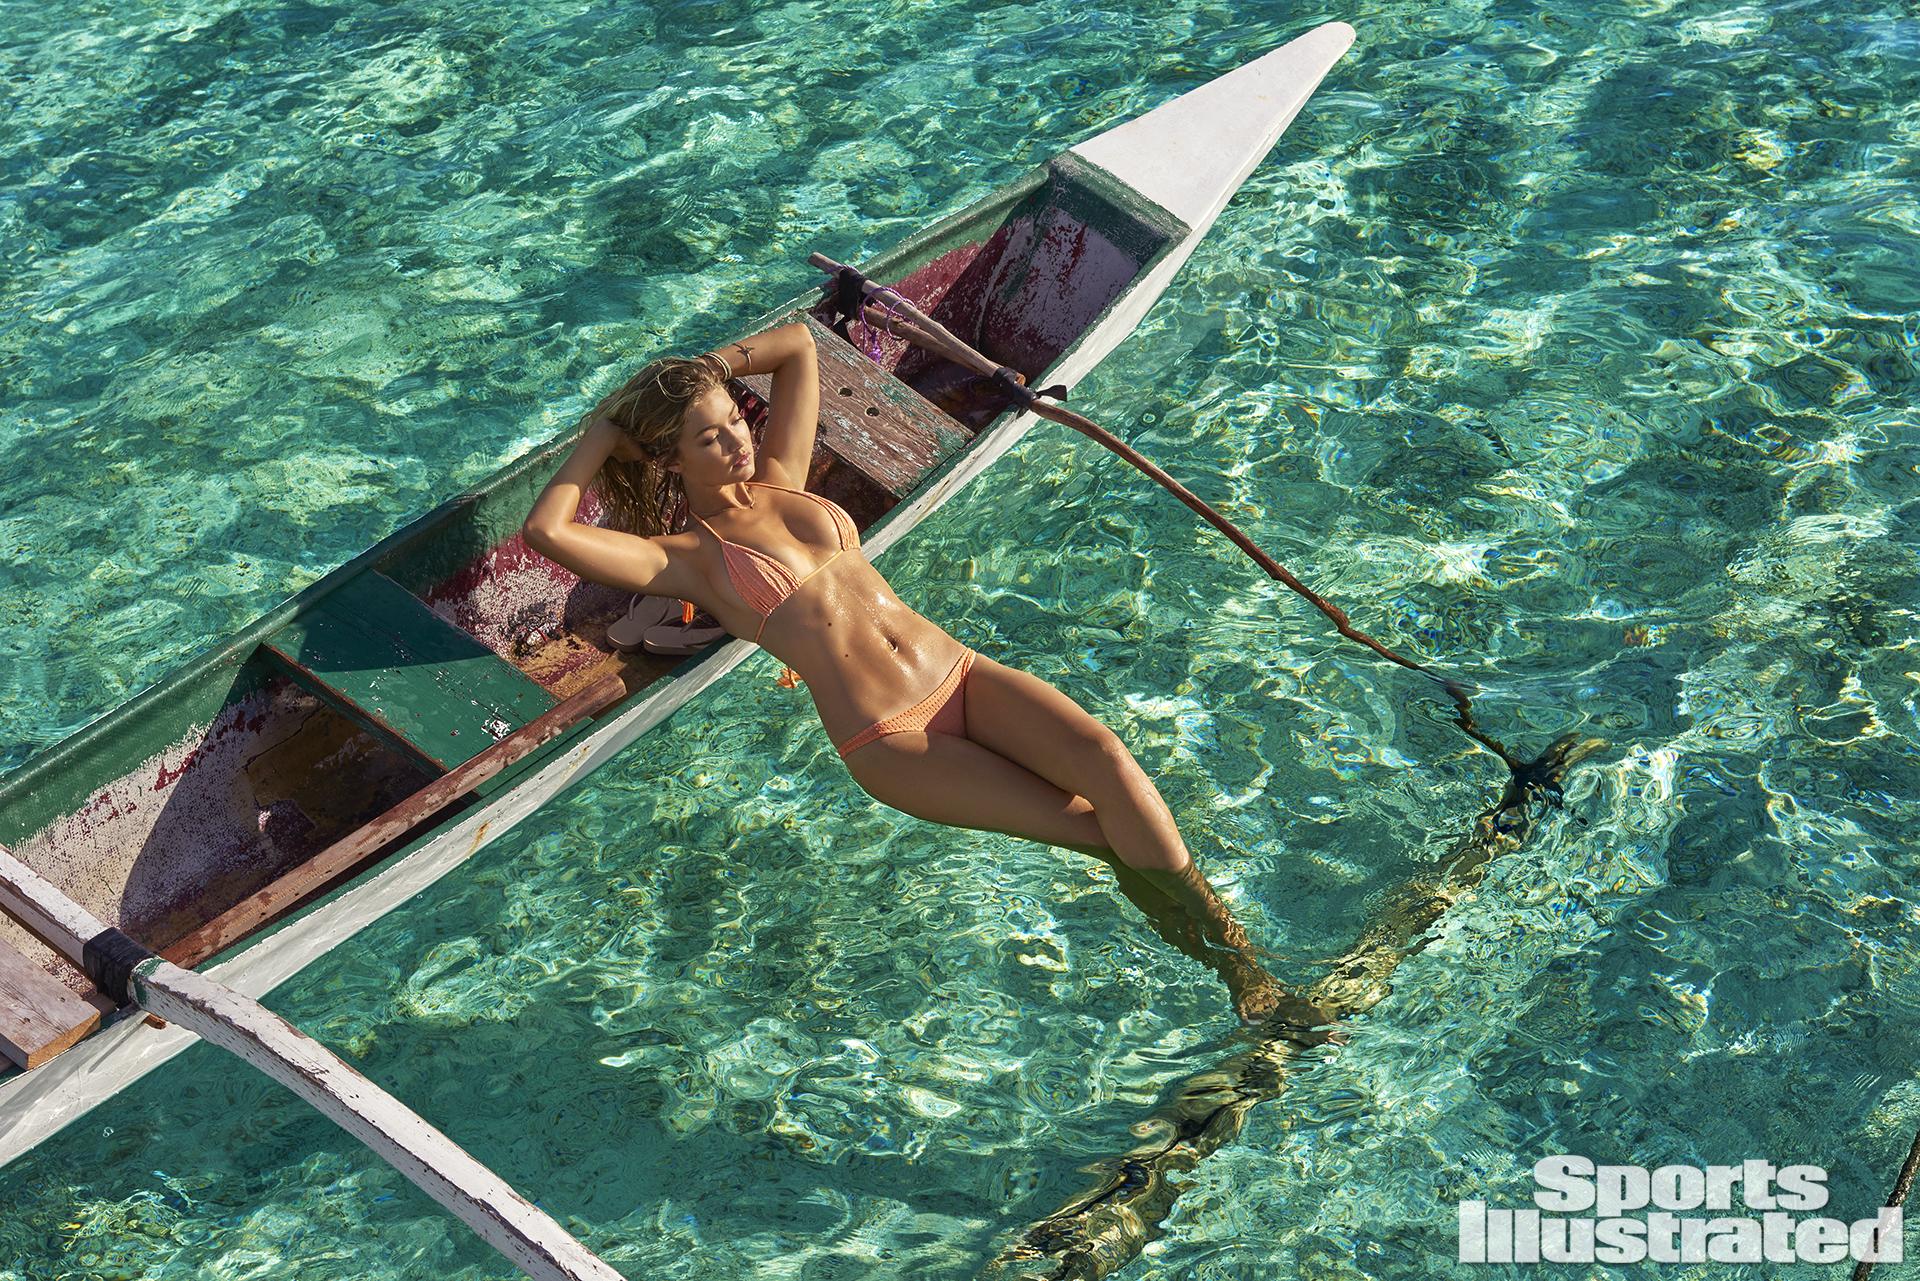 Gigi Hadid was photographed by Yu Tsai in The Islands Of Tahiti. Swimsuit by Acacia Swimwear.